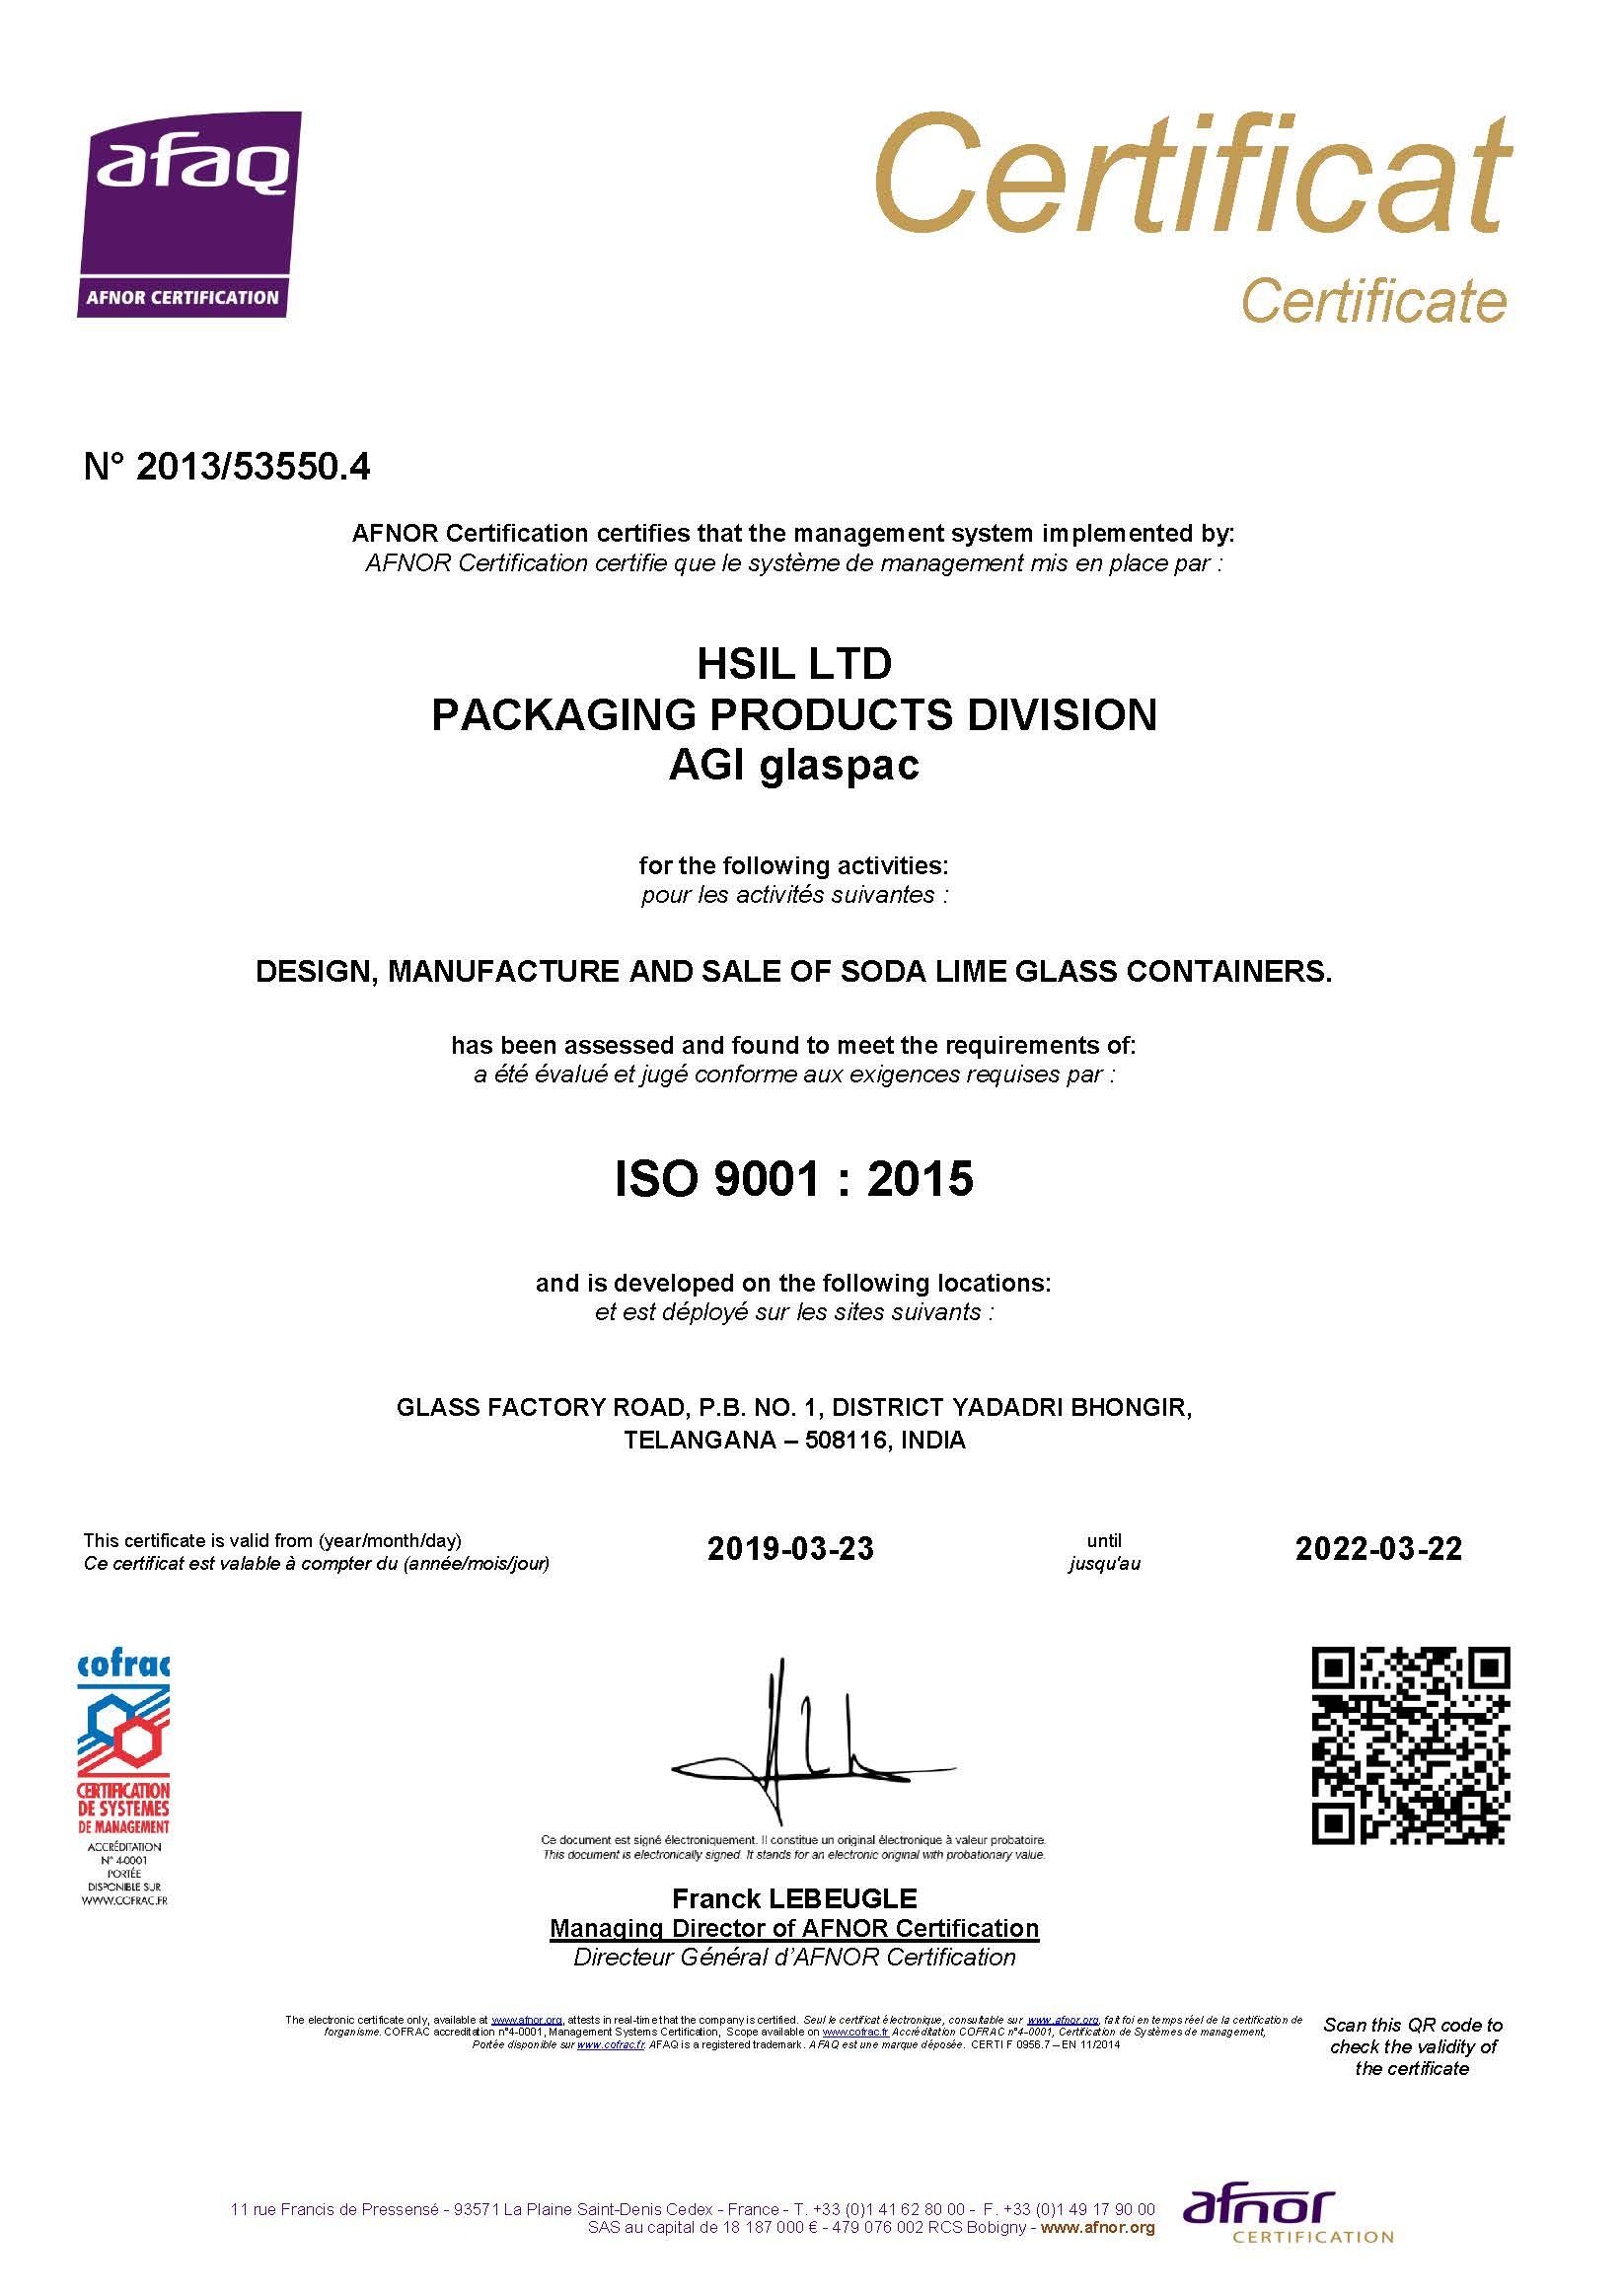 Bgr Certificate 3